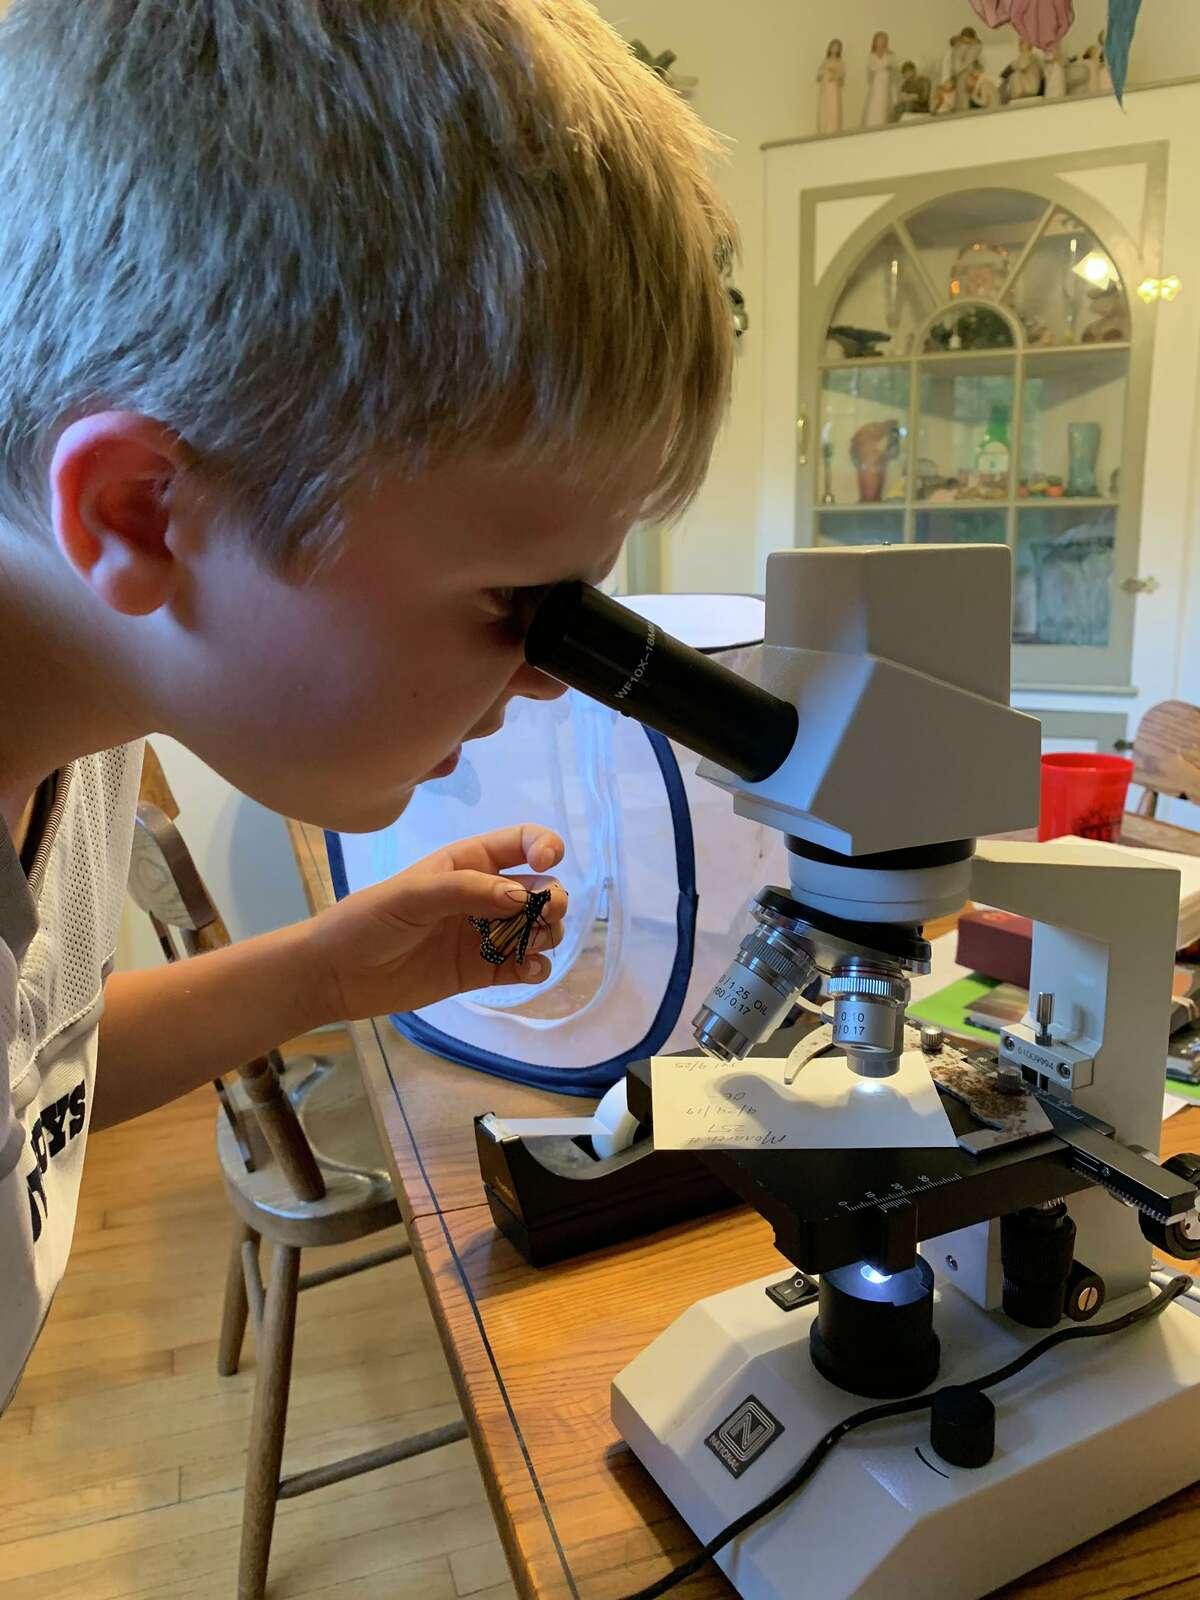 Owen Miller looking through a microscopt